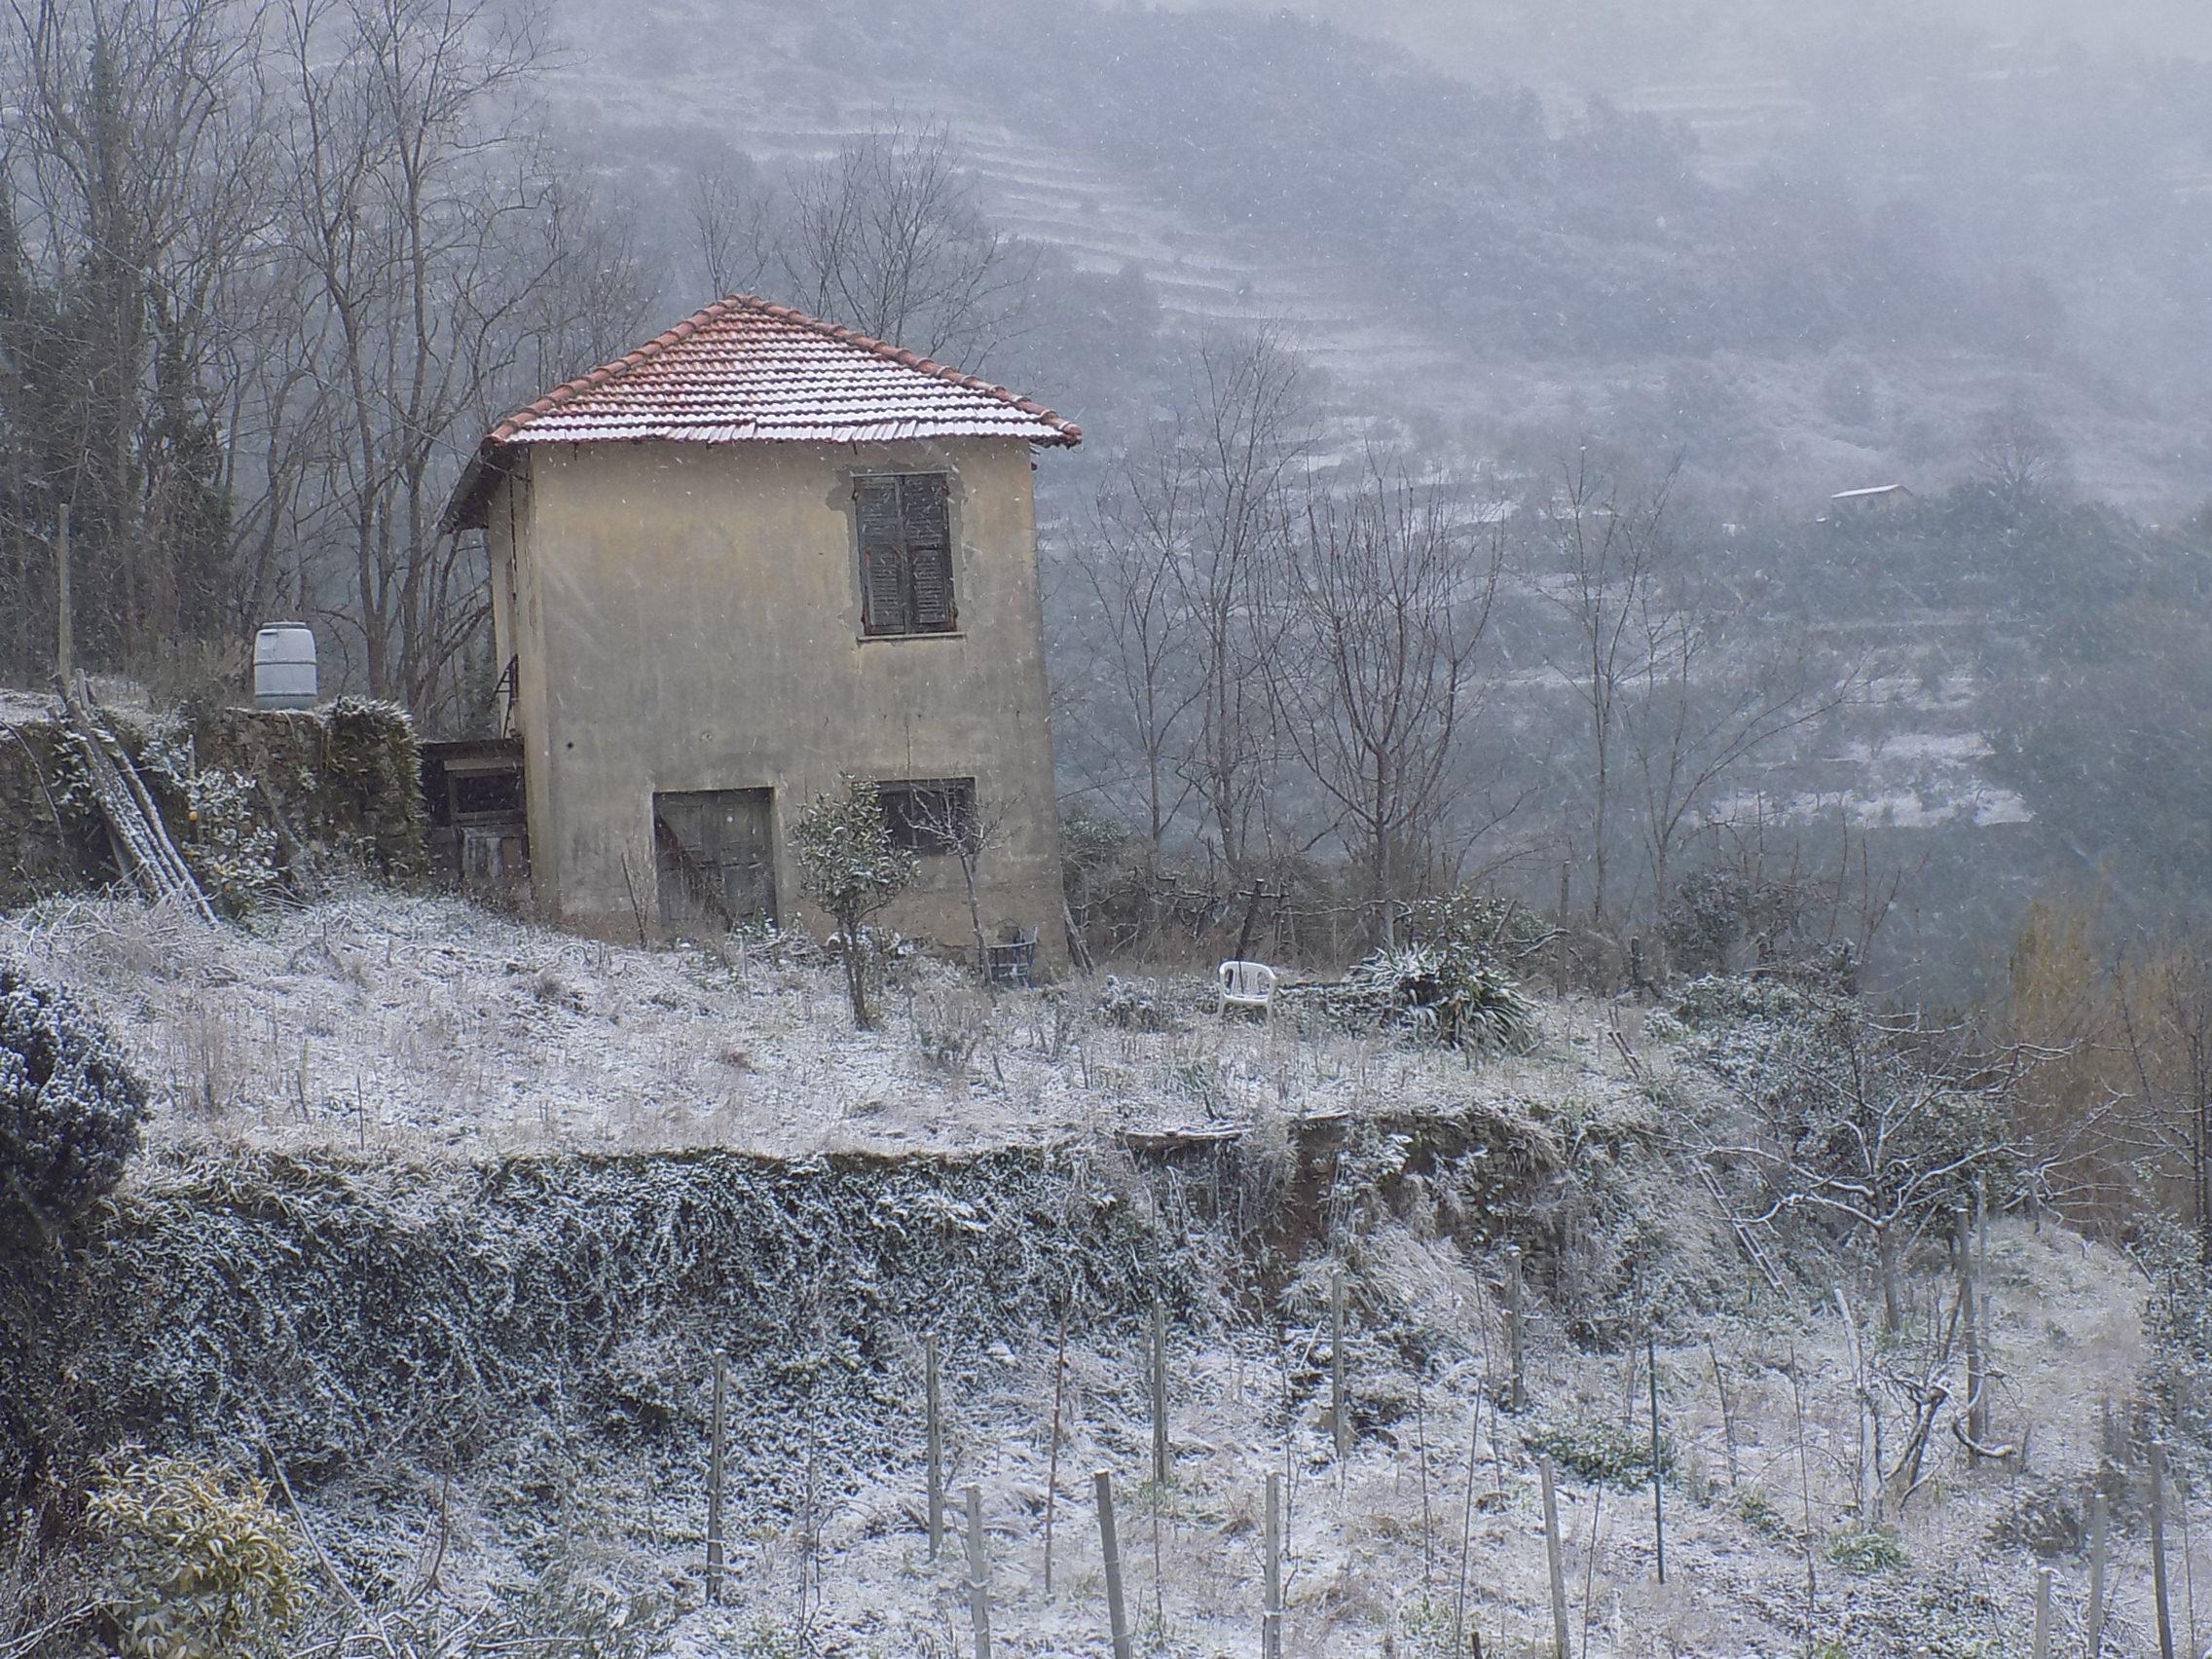 Nowcasting liguria-vernazza-25-febbraio-067.jpg